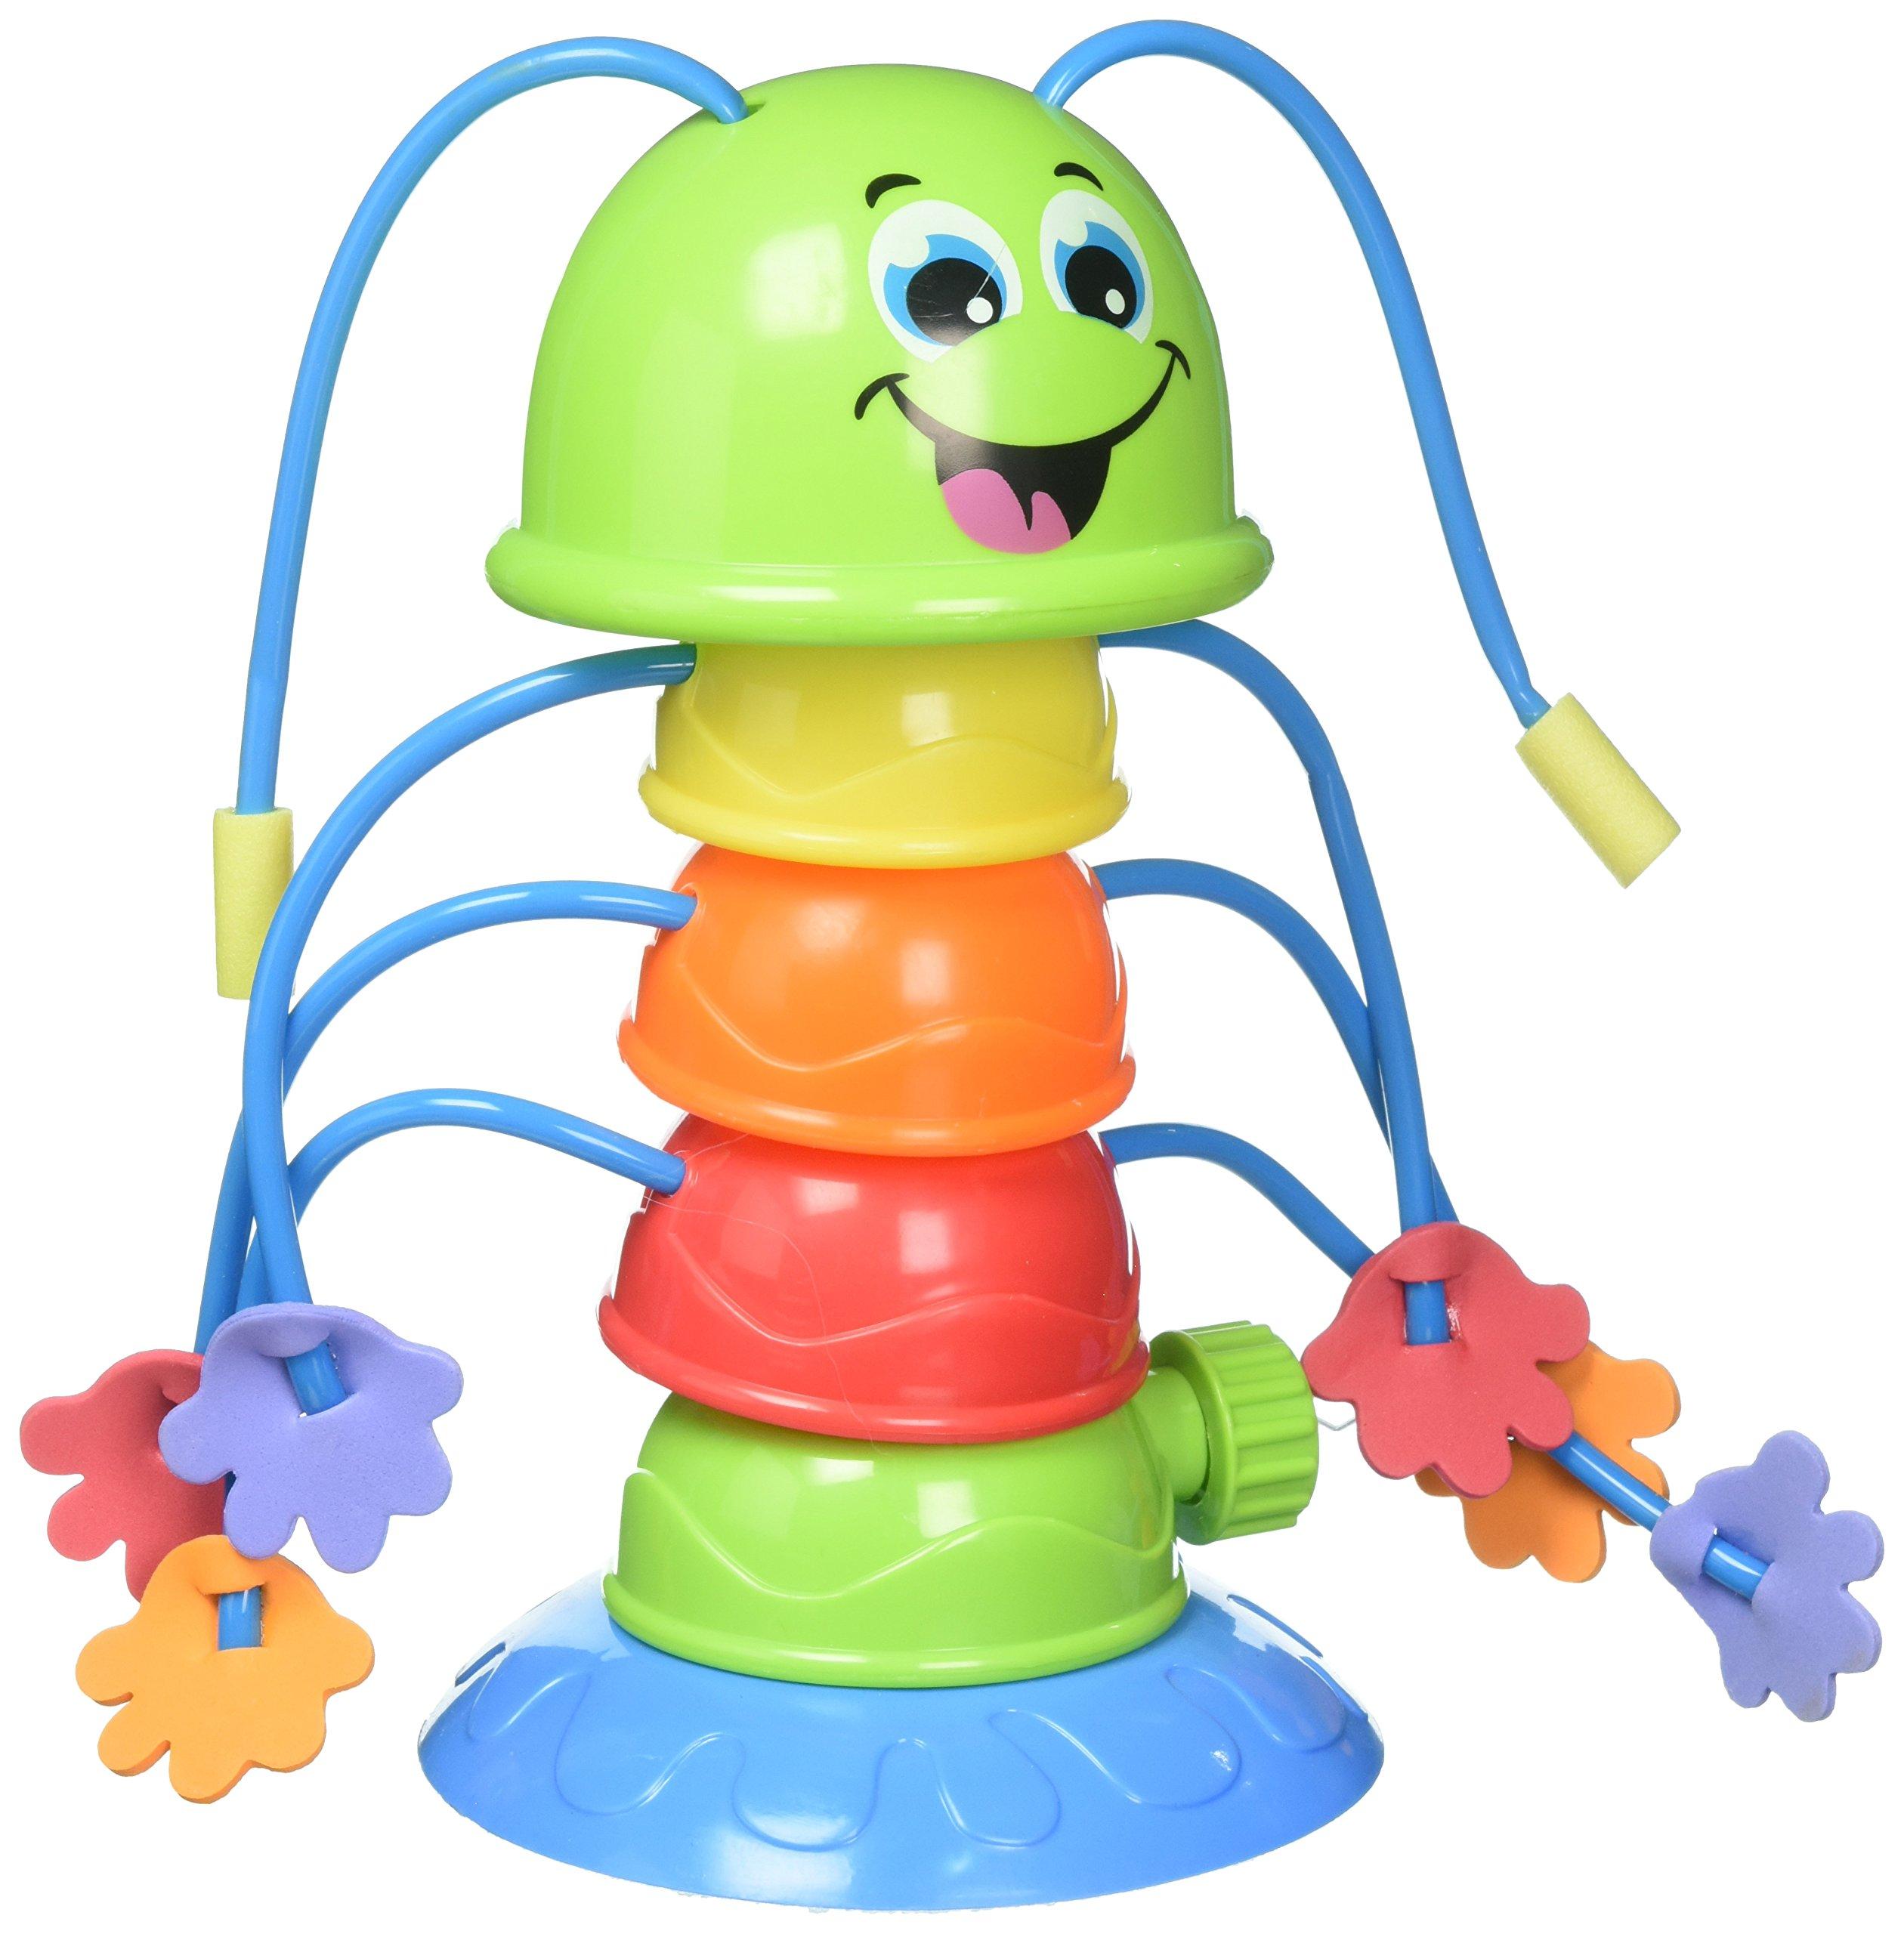 Wigglin' Waterpillar with 8 Sprinkling Water Wiggers